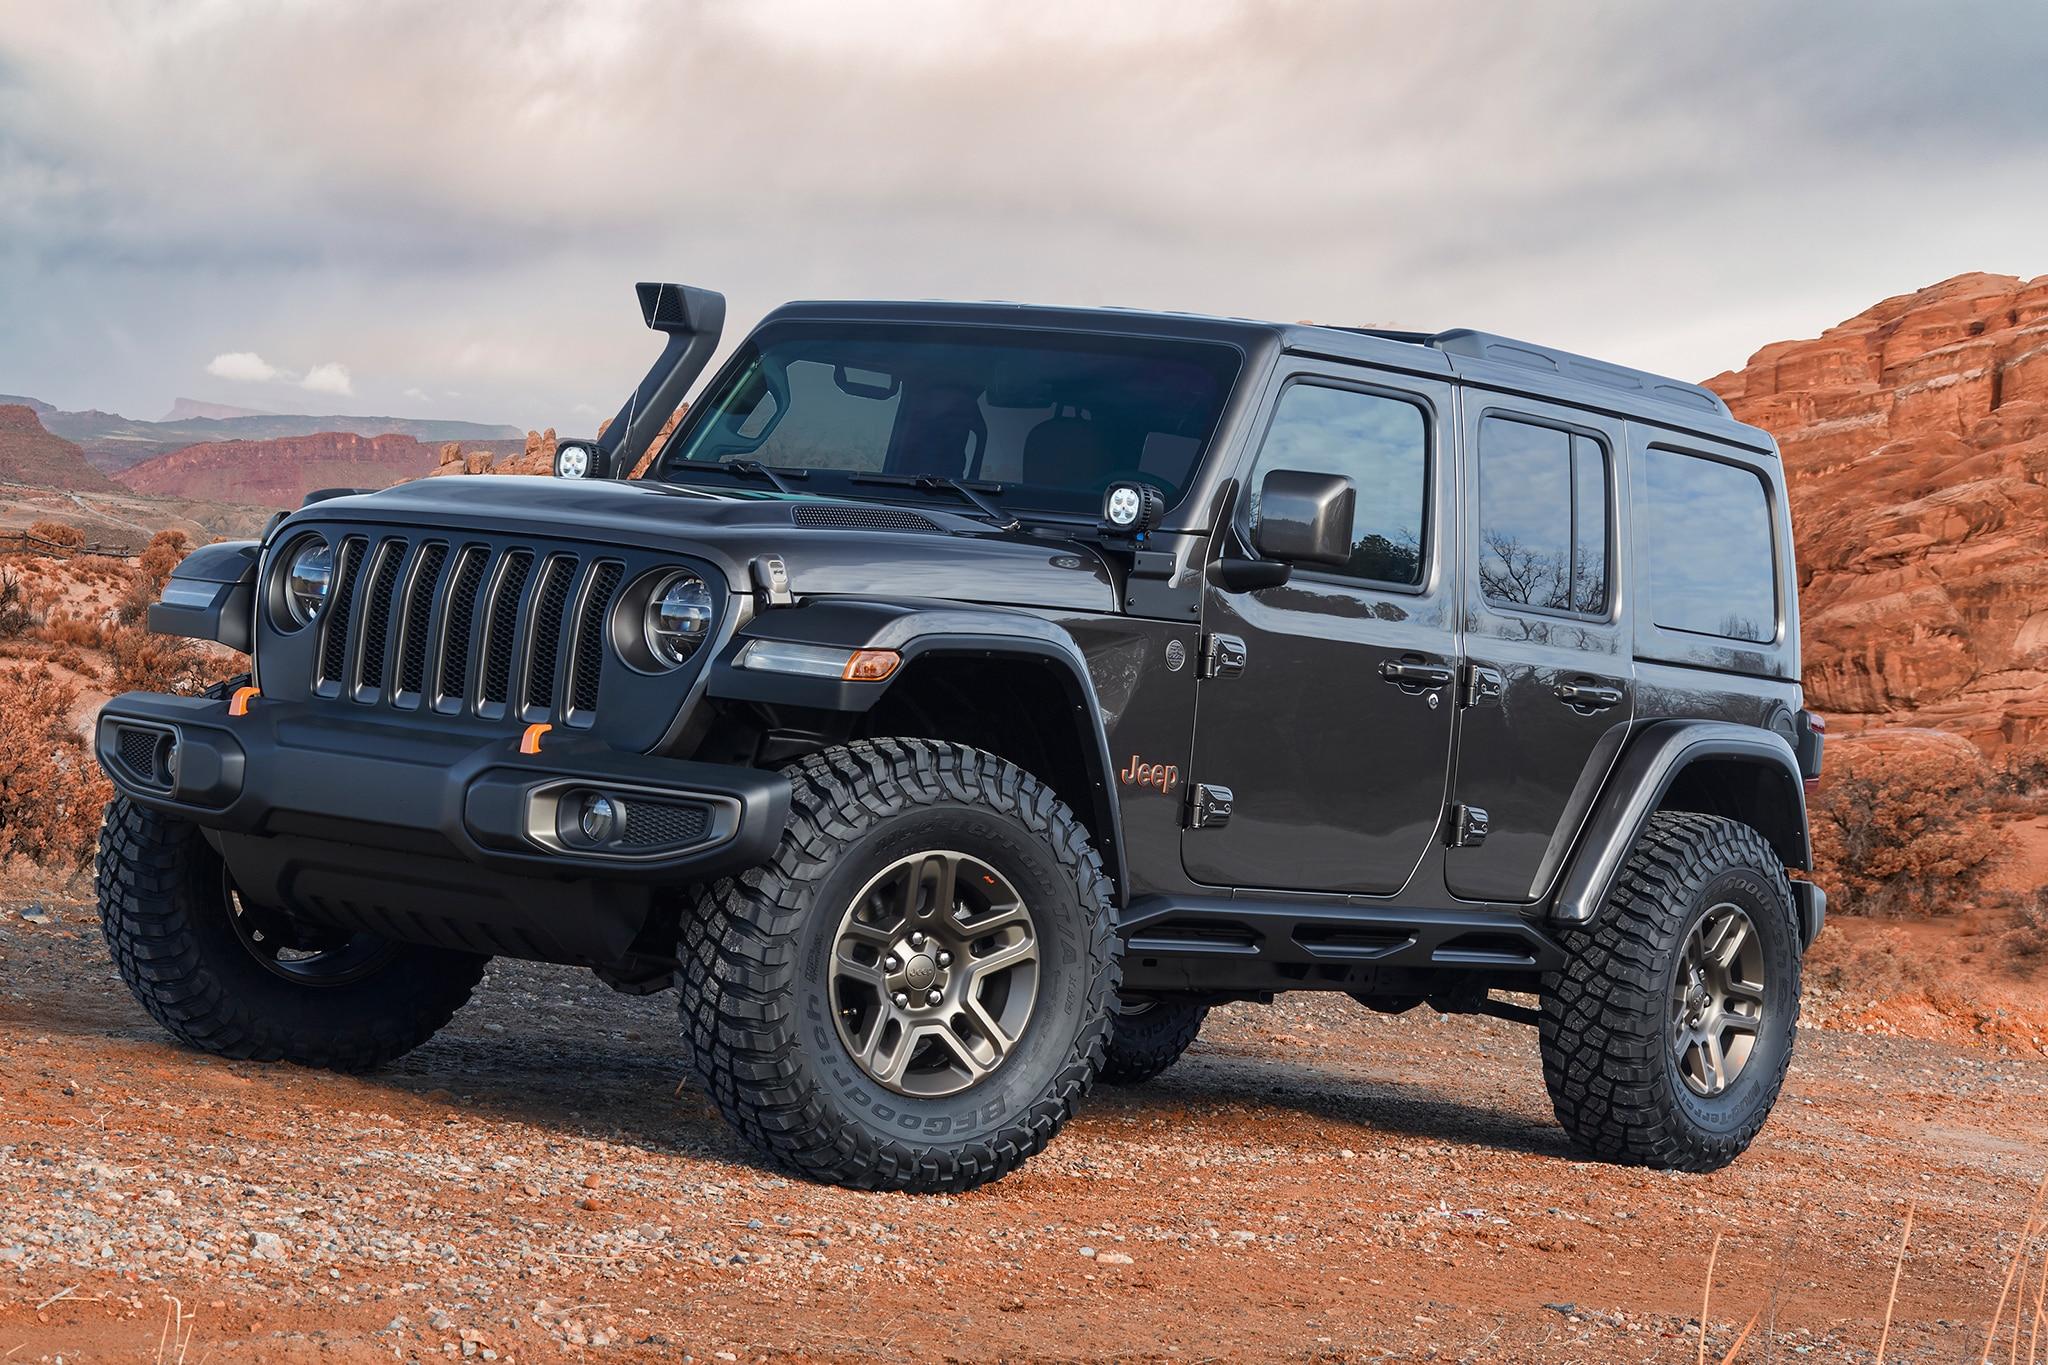 Seven Super Jeep And Mopar Customs Ready To Roll Automobile Magazine